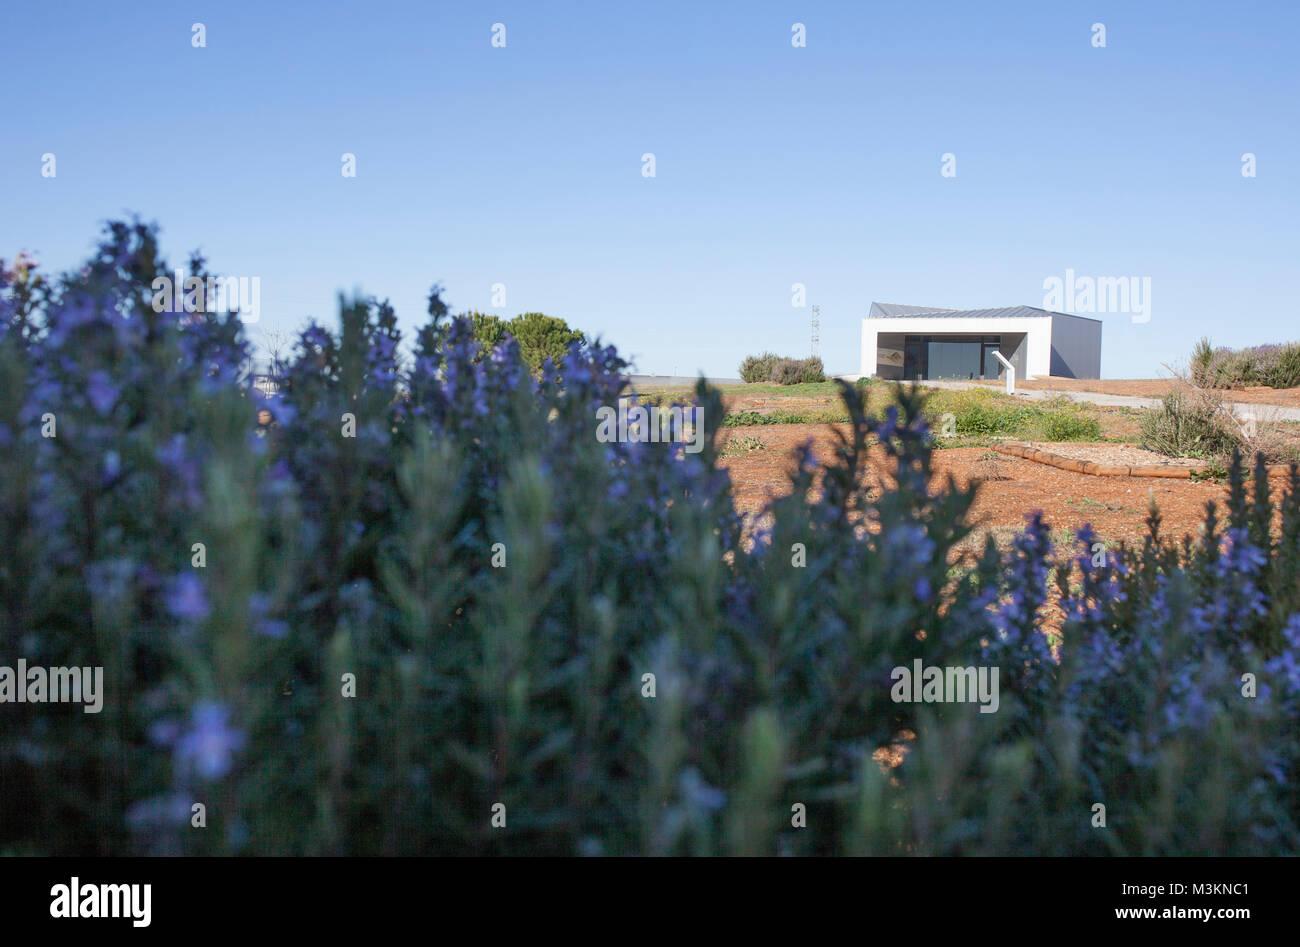 Archeological site of Huerta Montero, Tholos Dolmen in Almendralejo, Spain. Visitors centre building - Stock Image